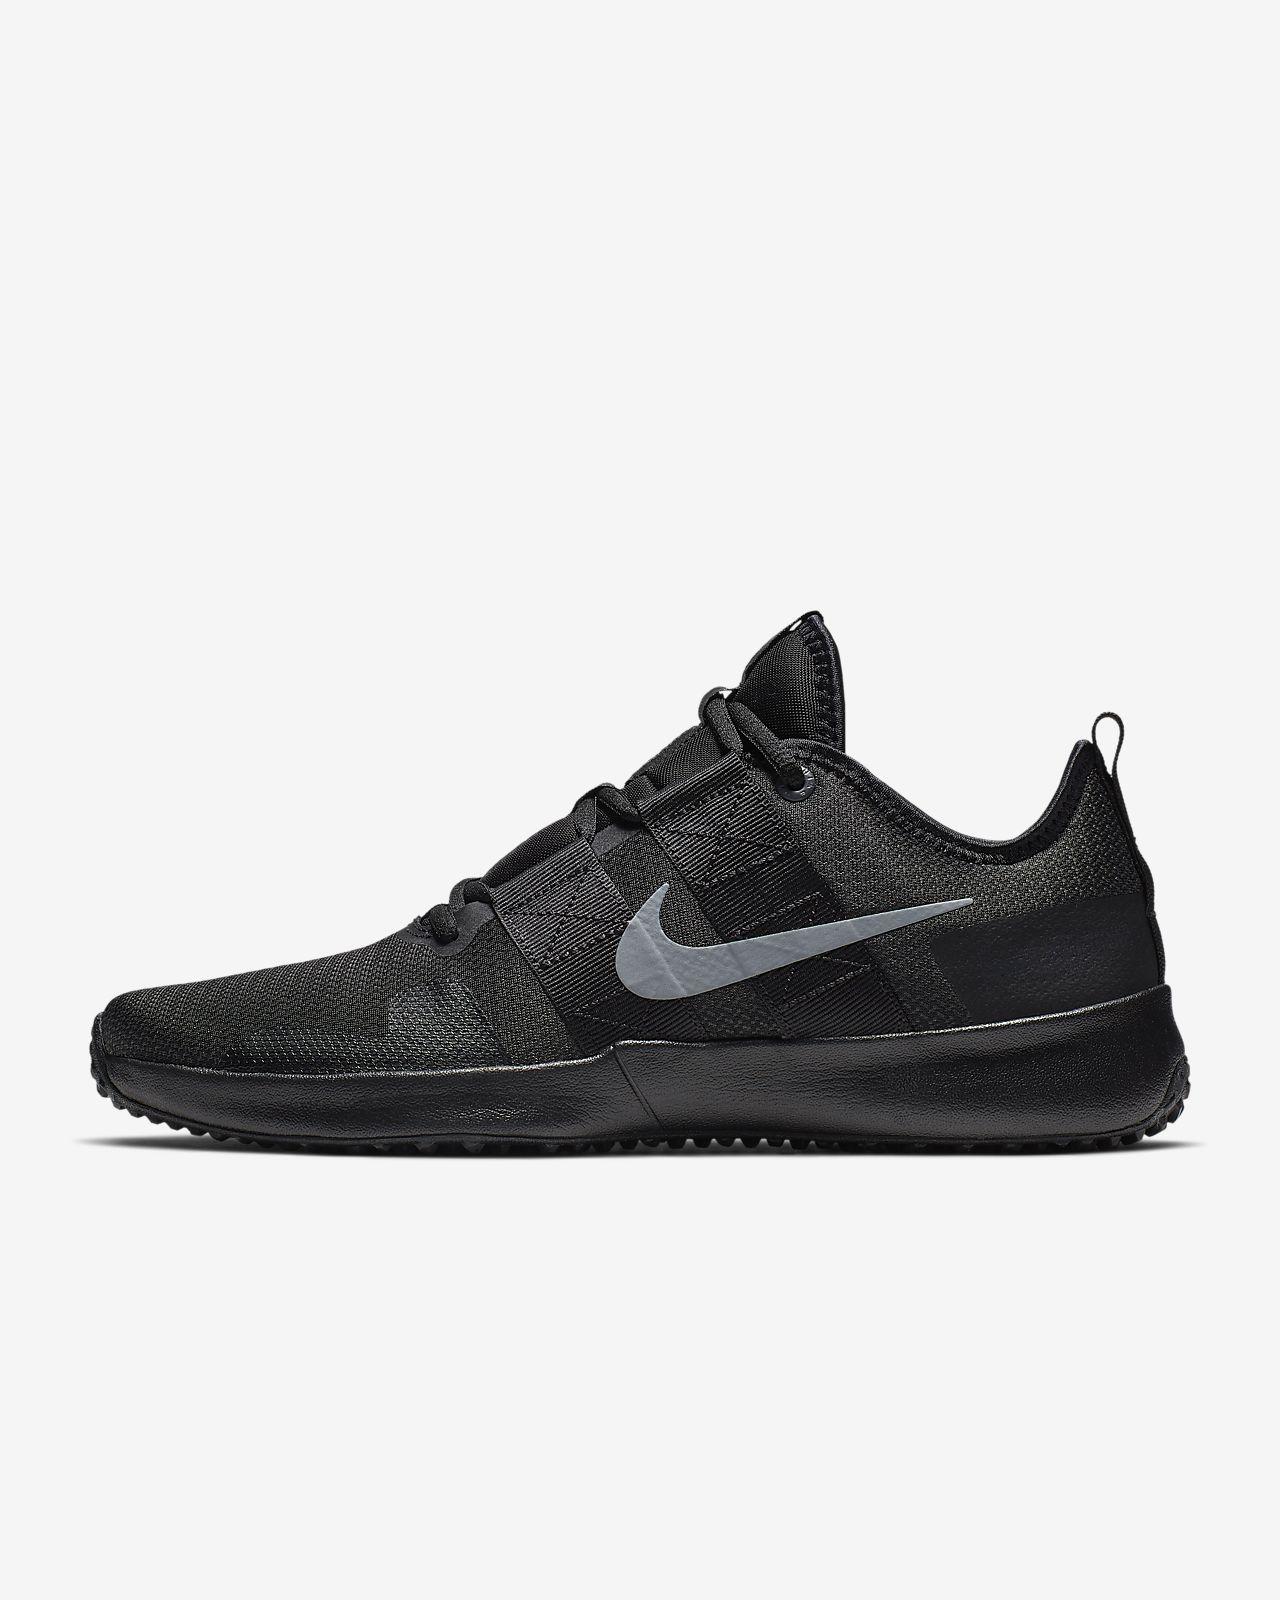 Pánská tréninková bota Nike Varsity Compete TR 2